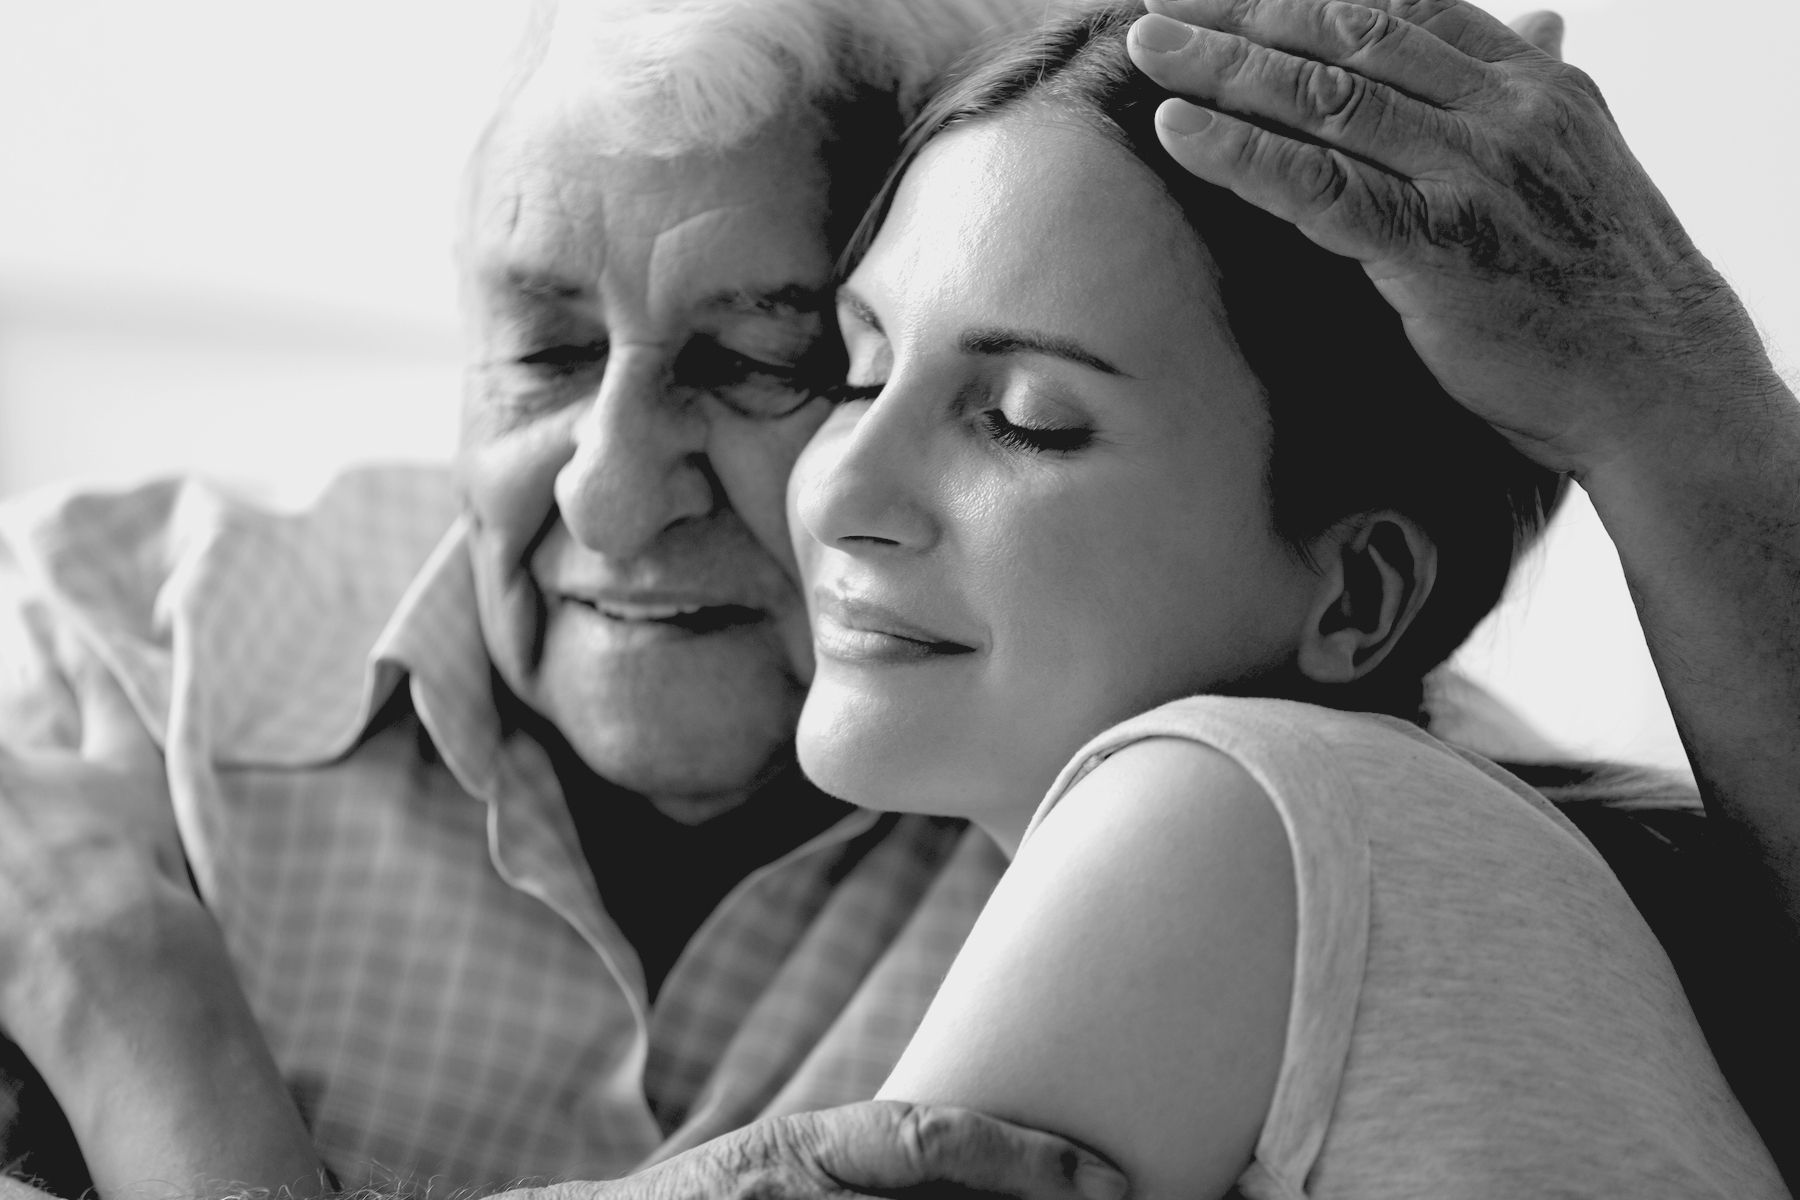 Grown daughter and father hug